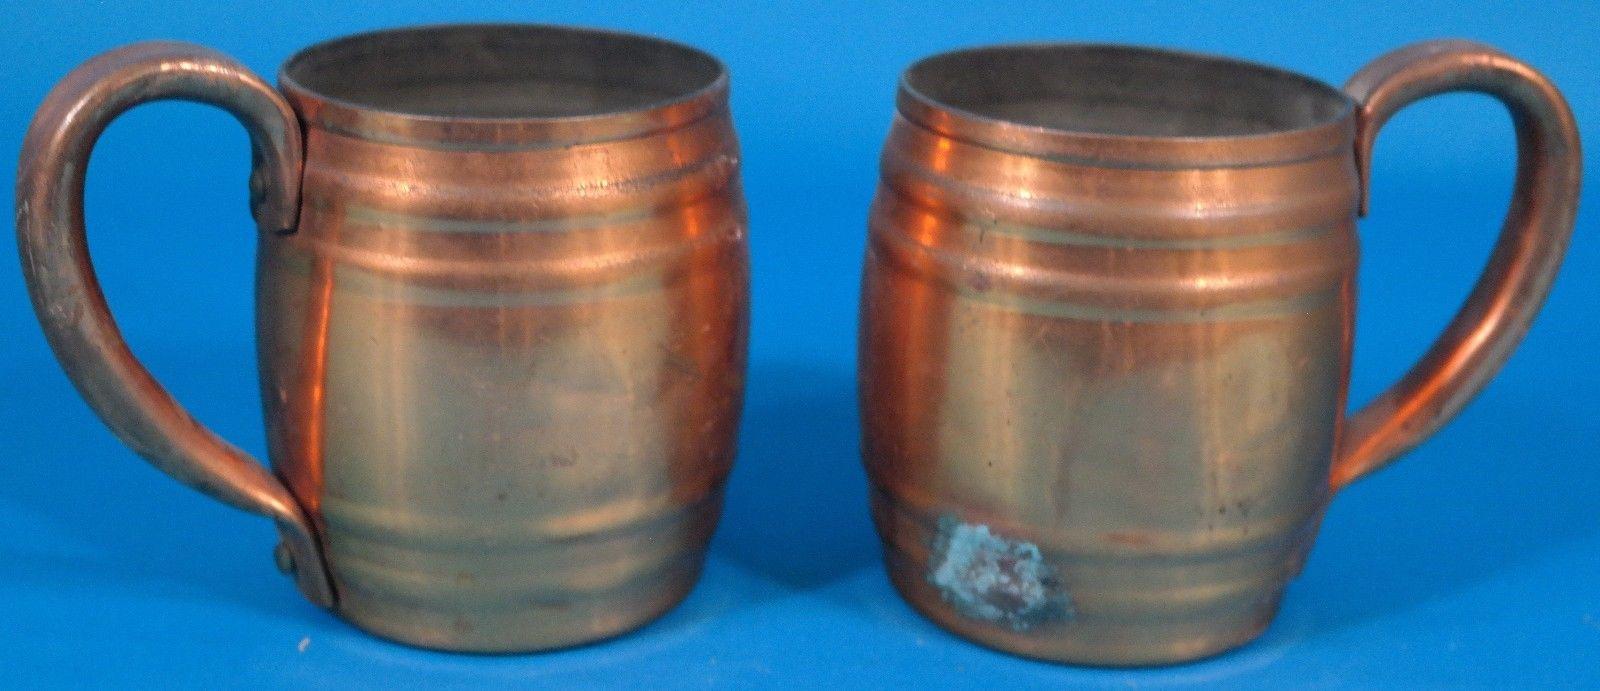 Old Colony Copper Co. Set of 2 Copper Mug